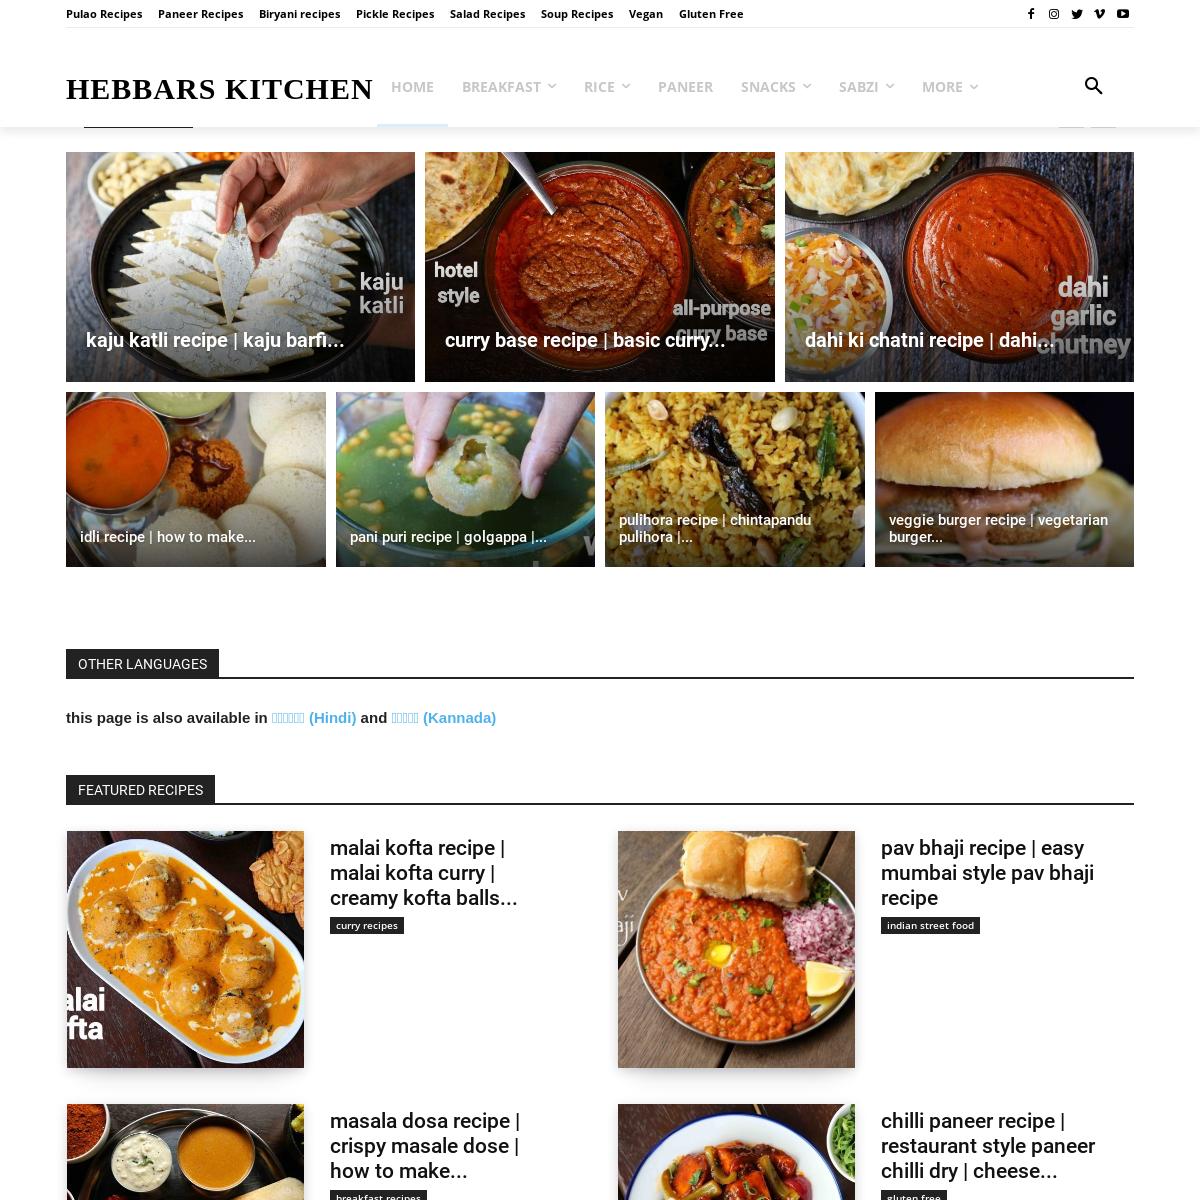 Hebbars Kitchen Indian Veg Recipes Vegetarian Indian Recipes Blog Archived 2021 06 23